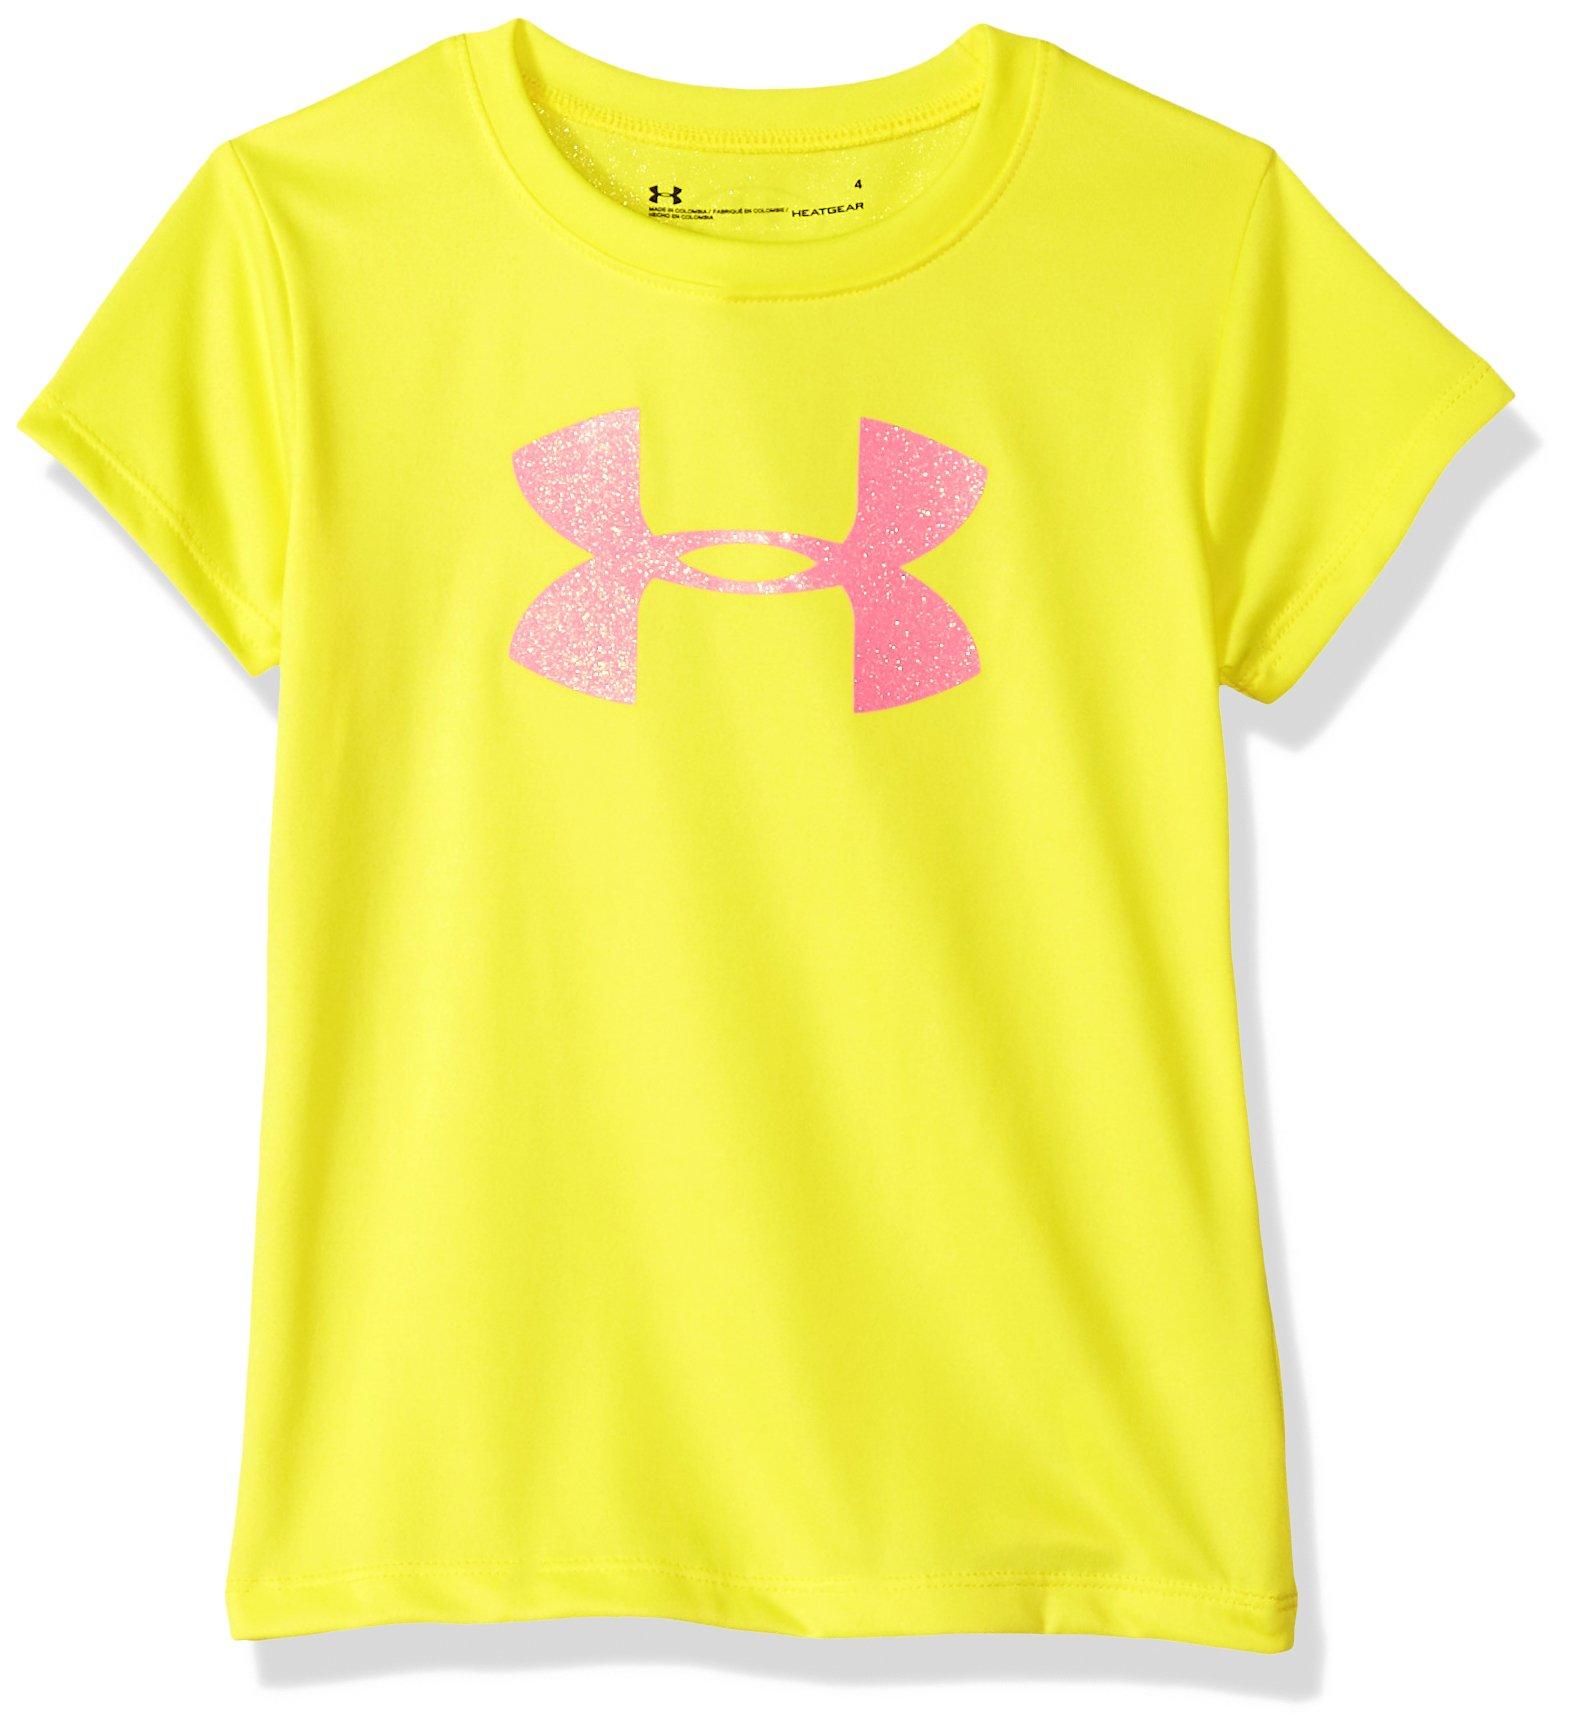 Under Armour Girls' Big Logo T-Shirt, Tokyo Lemon, 18M